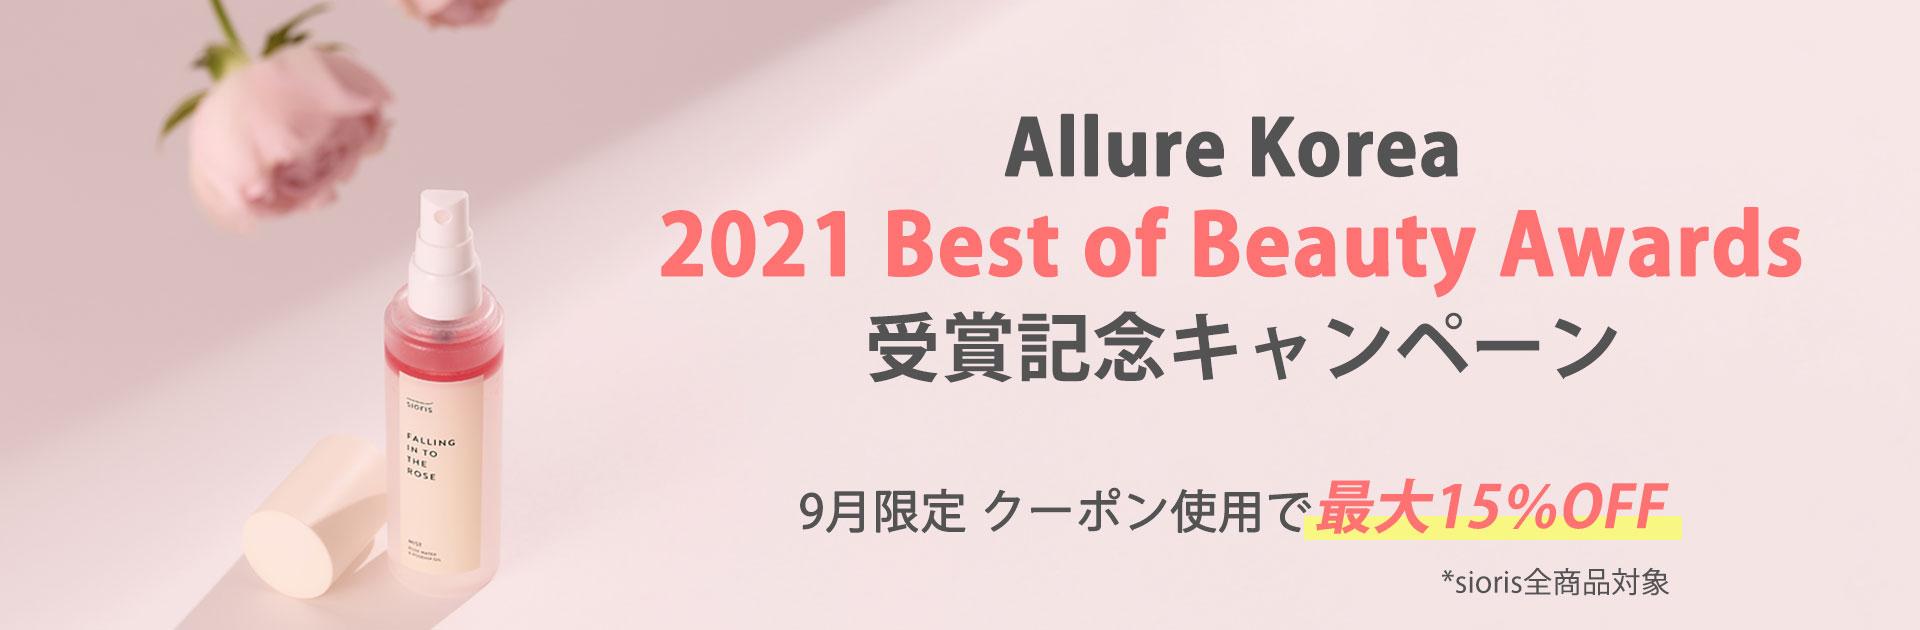 award_バナー_ロゴ無し.jpg